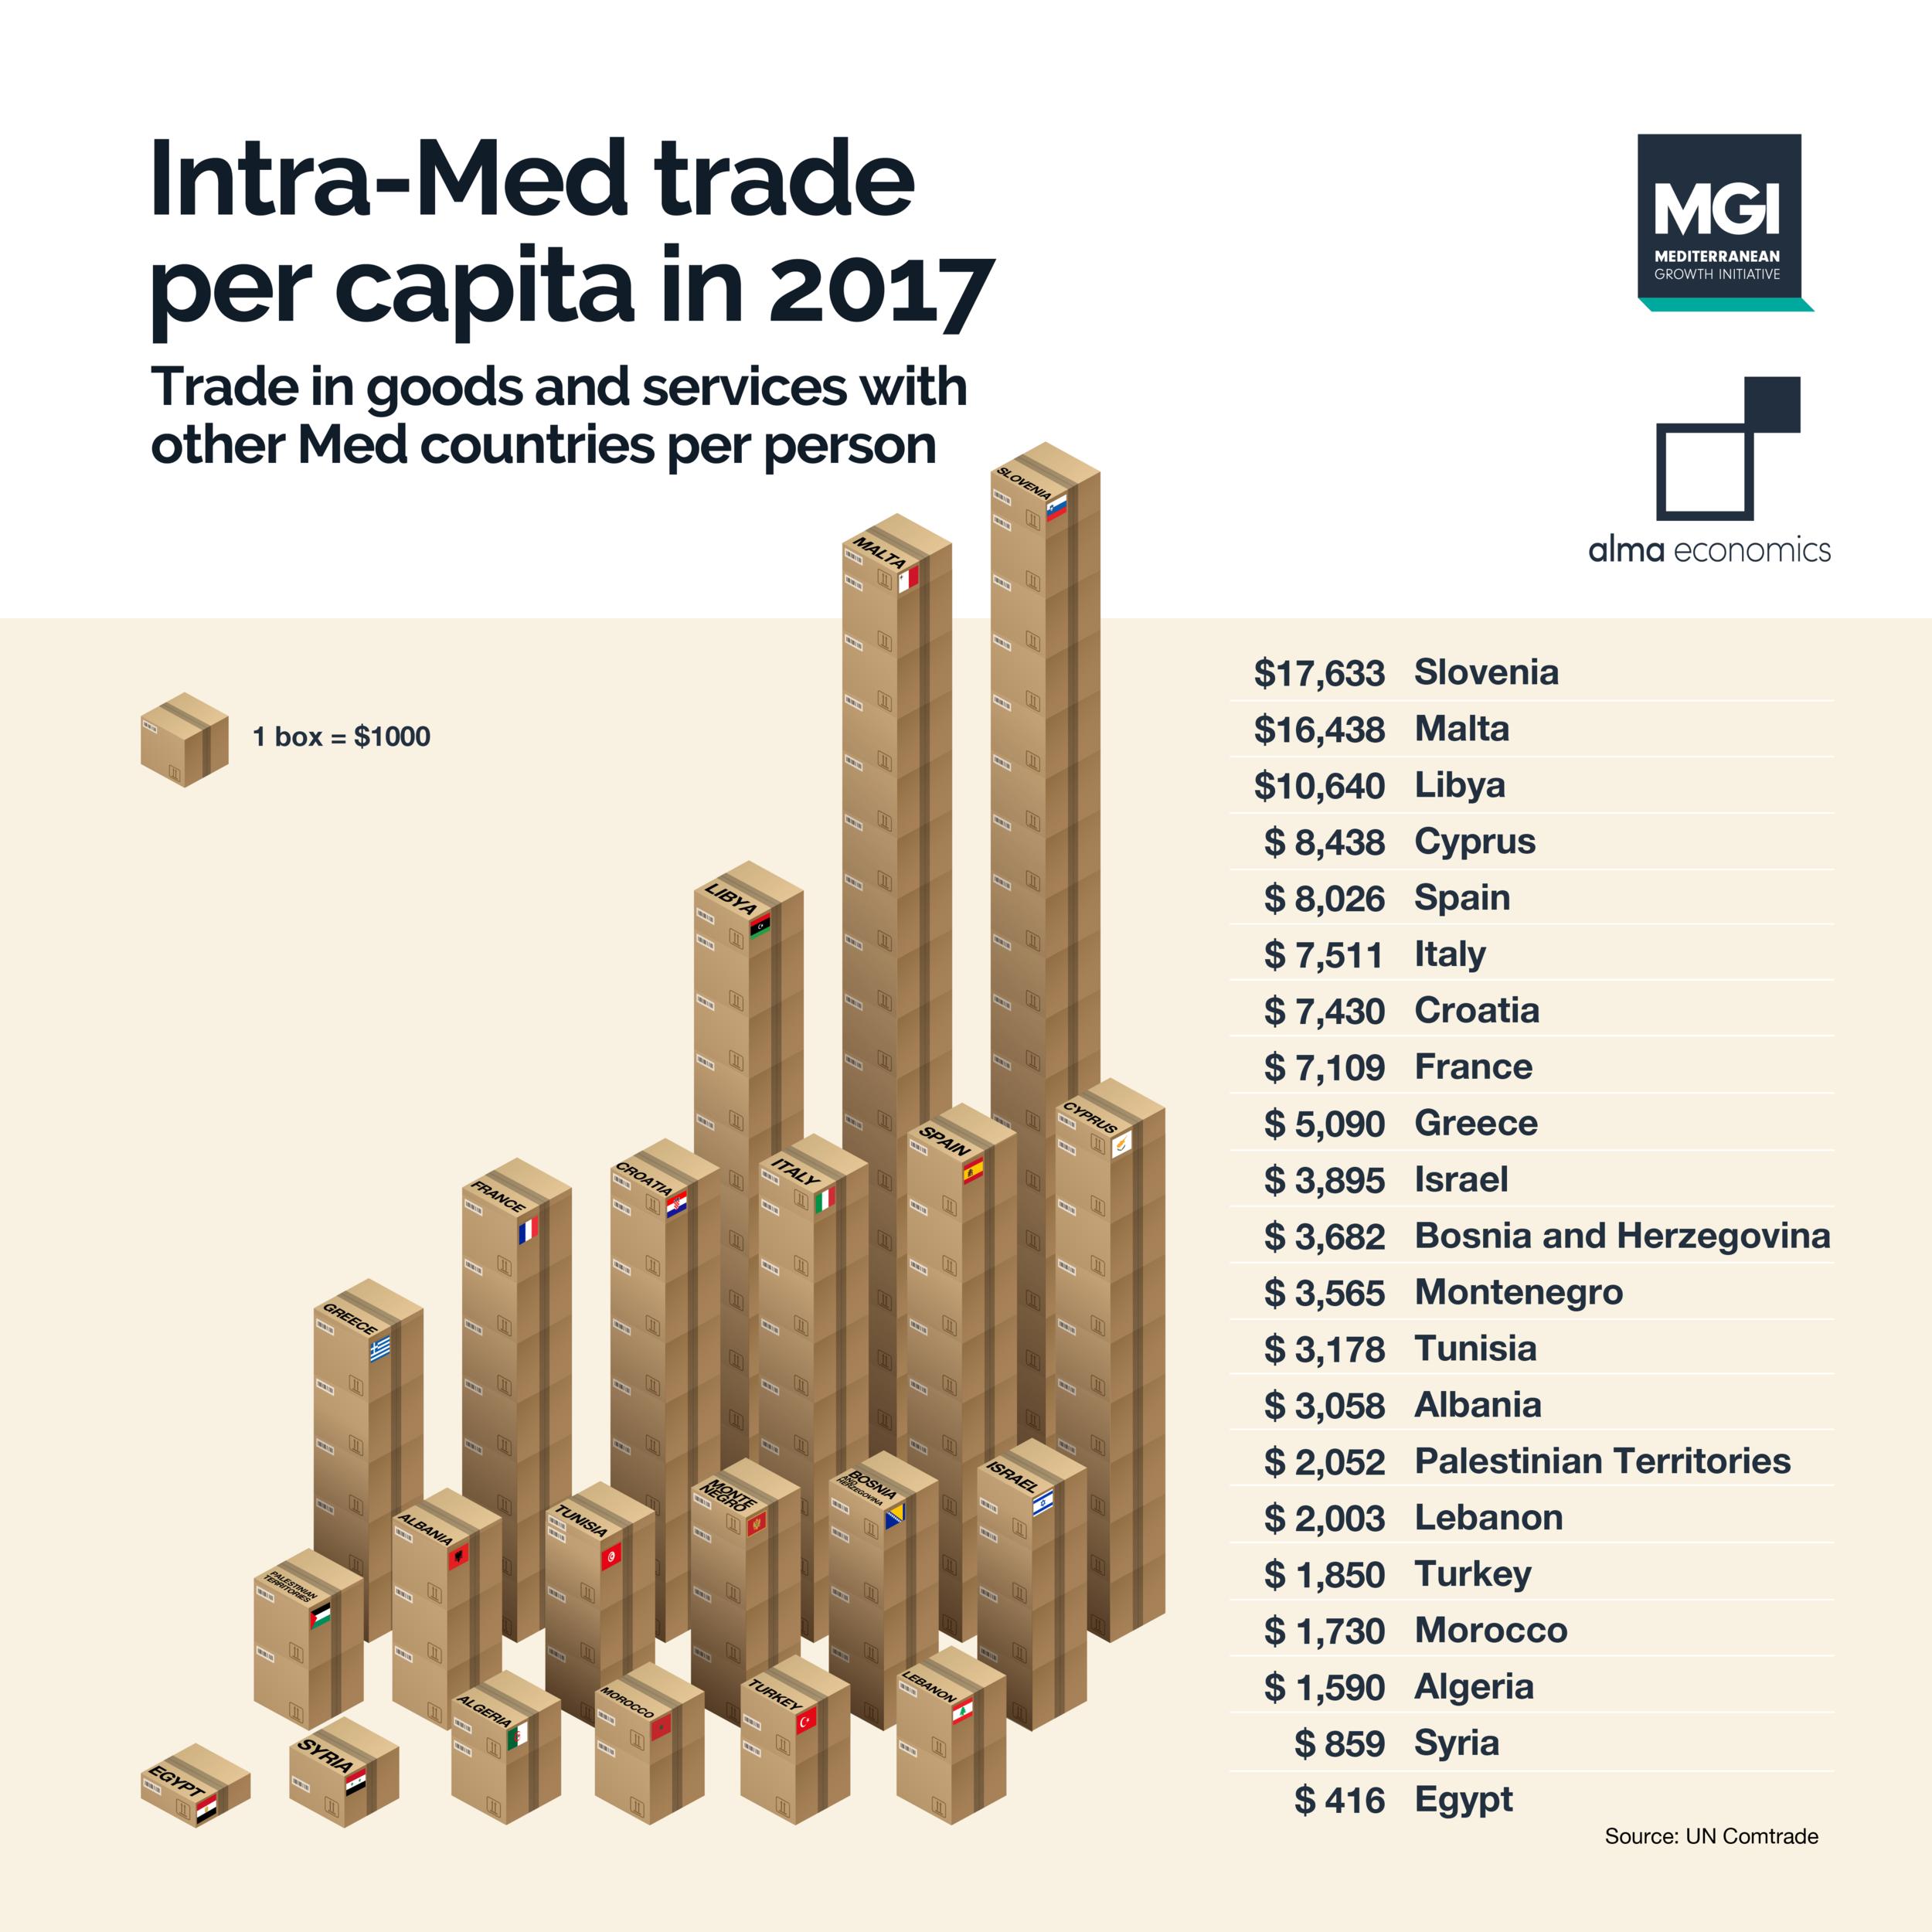 Intra-Med trade per capita in 2017 - Intra-Med trade is highest in Slovenia and Malta